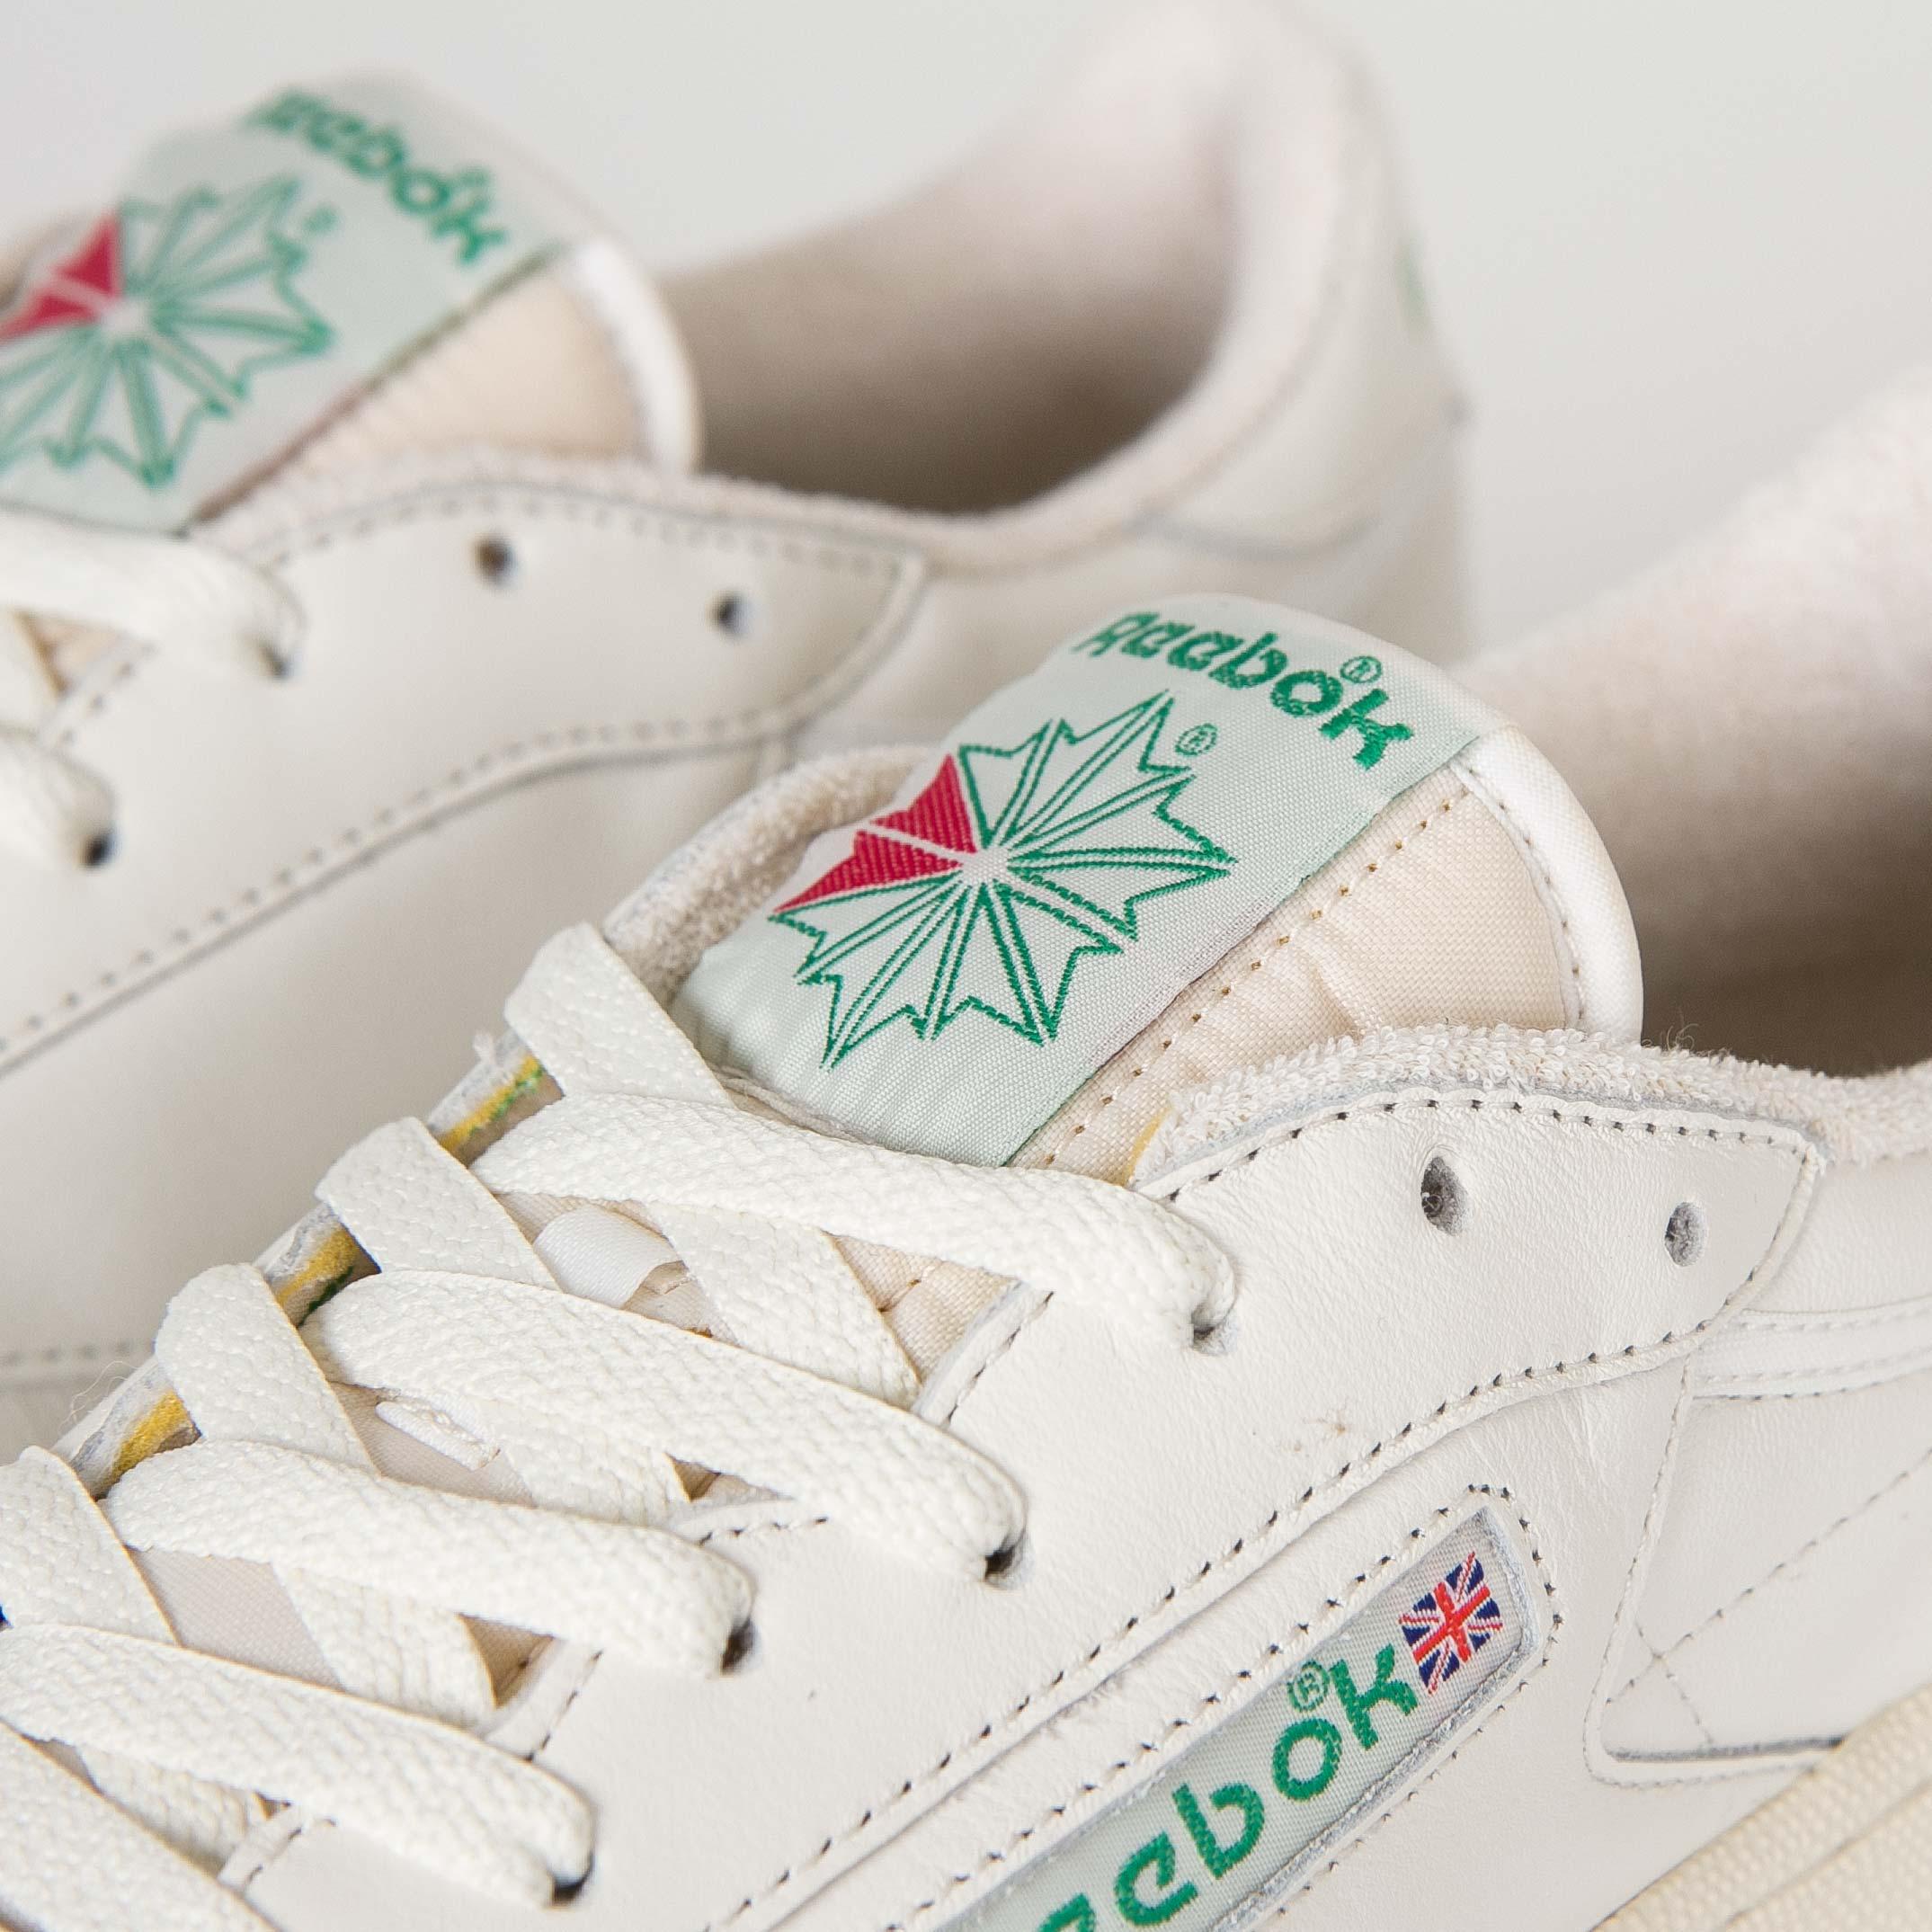 fdf8d70cca63ea Reebok Club C 85 Vintage - V67899 - Sneakersnstuff